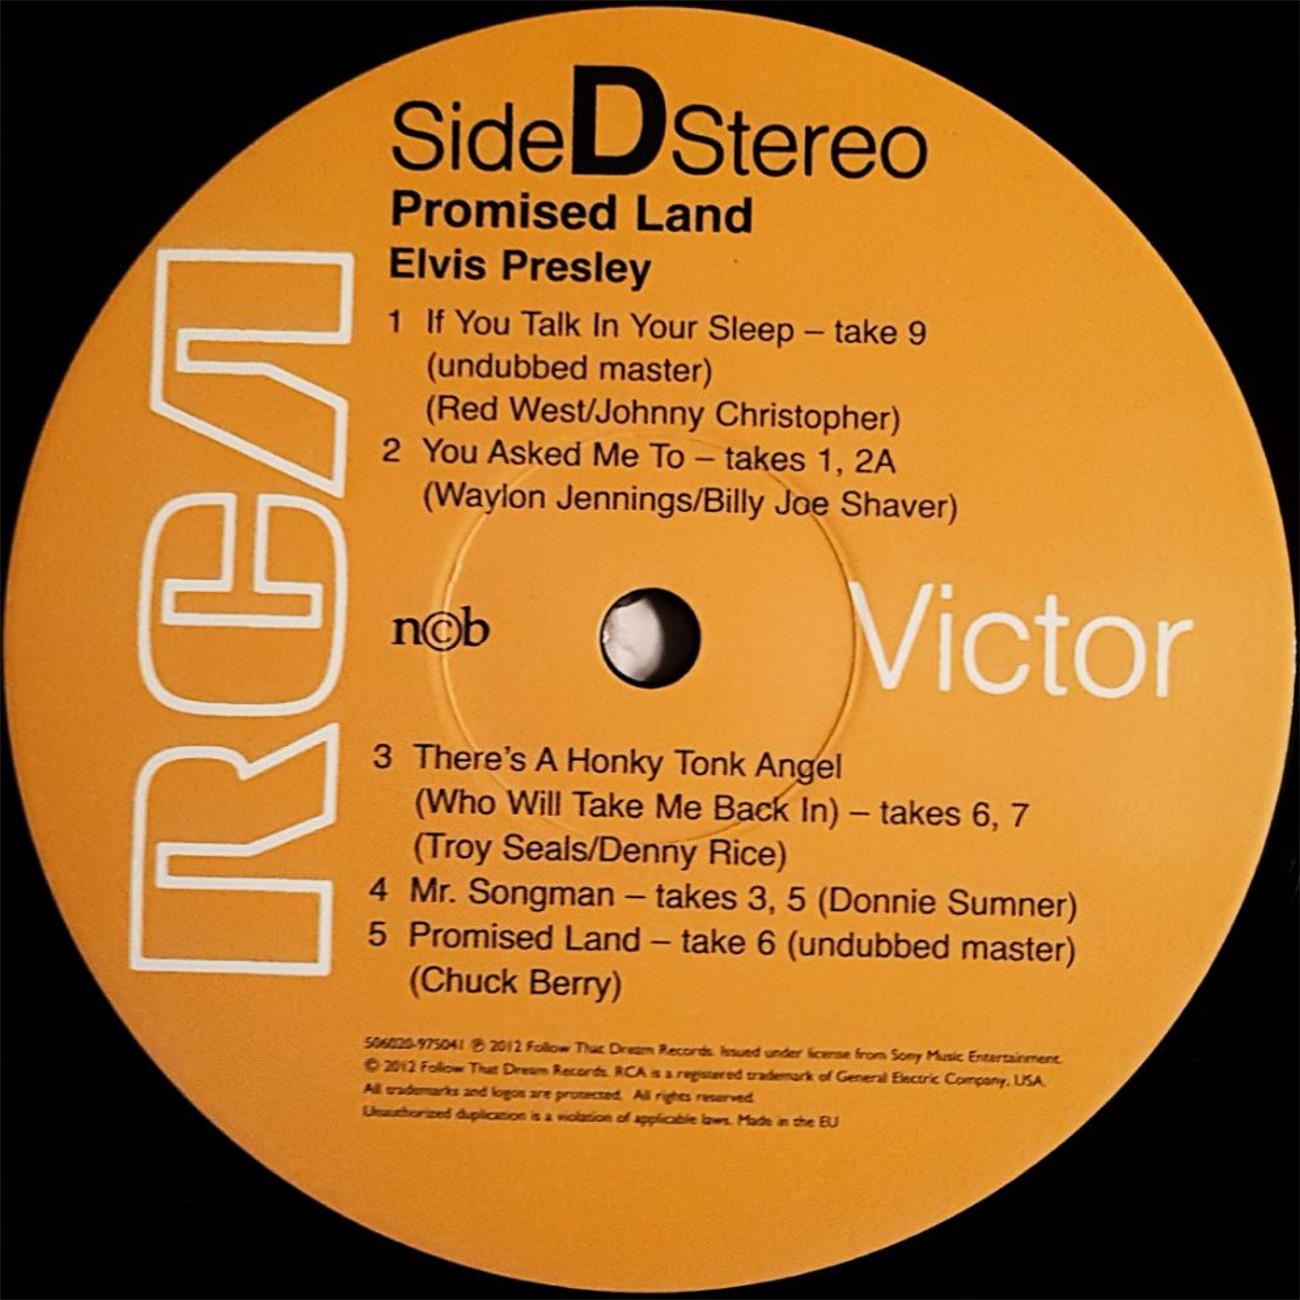 PROMISED LAND - THE COMPANION ALBUM 121cfuot